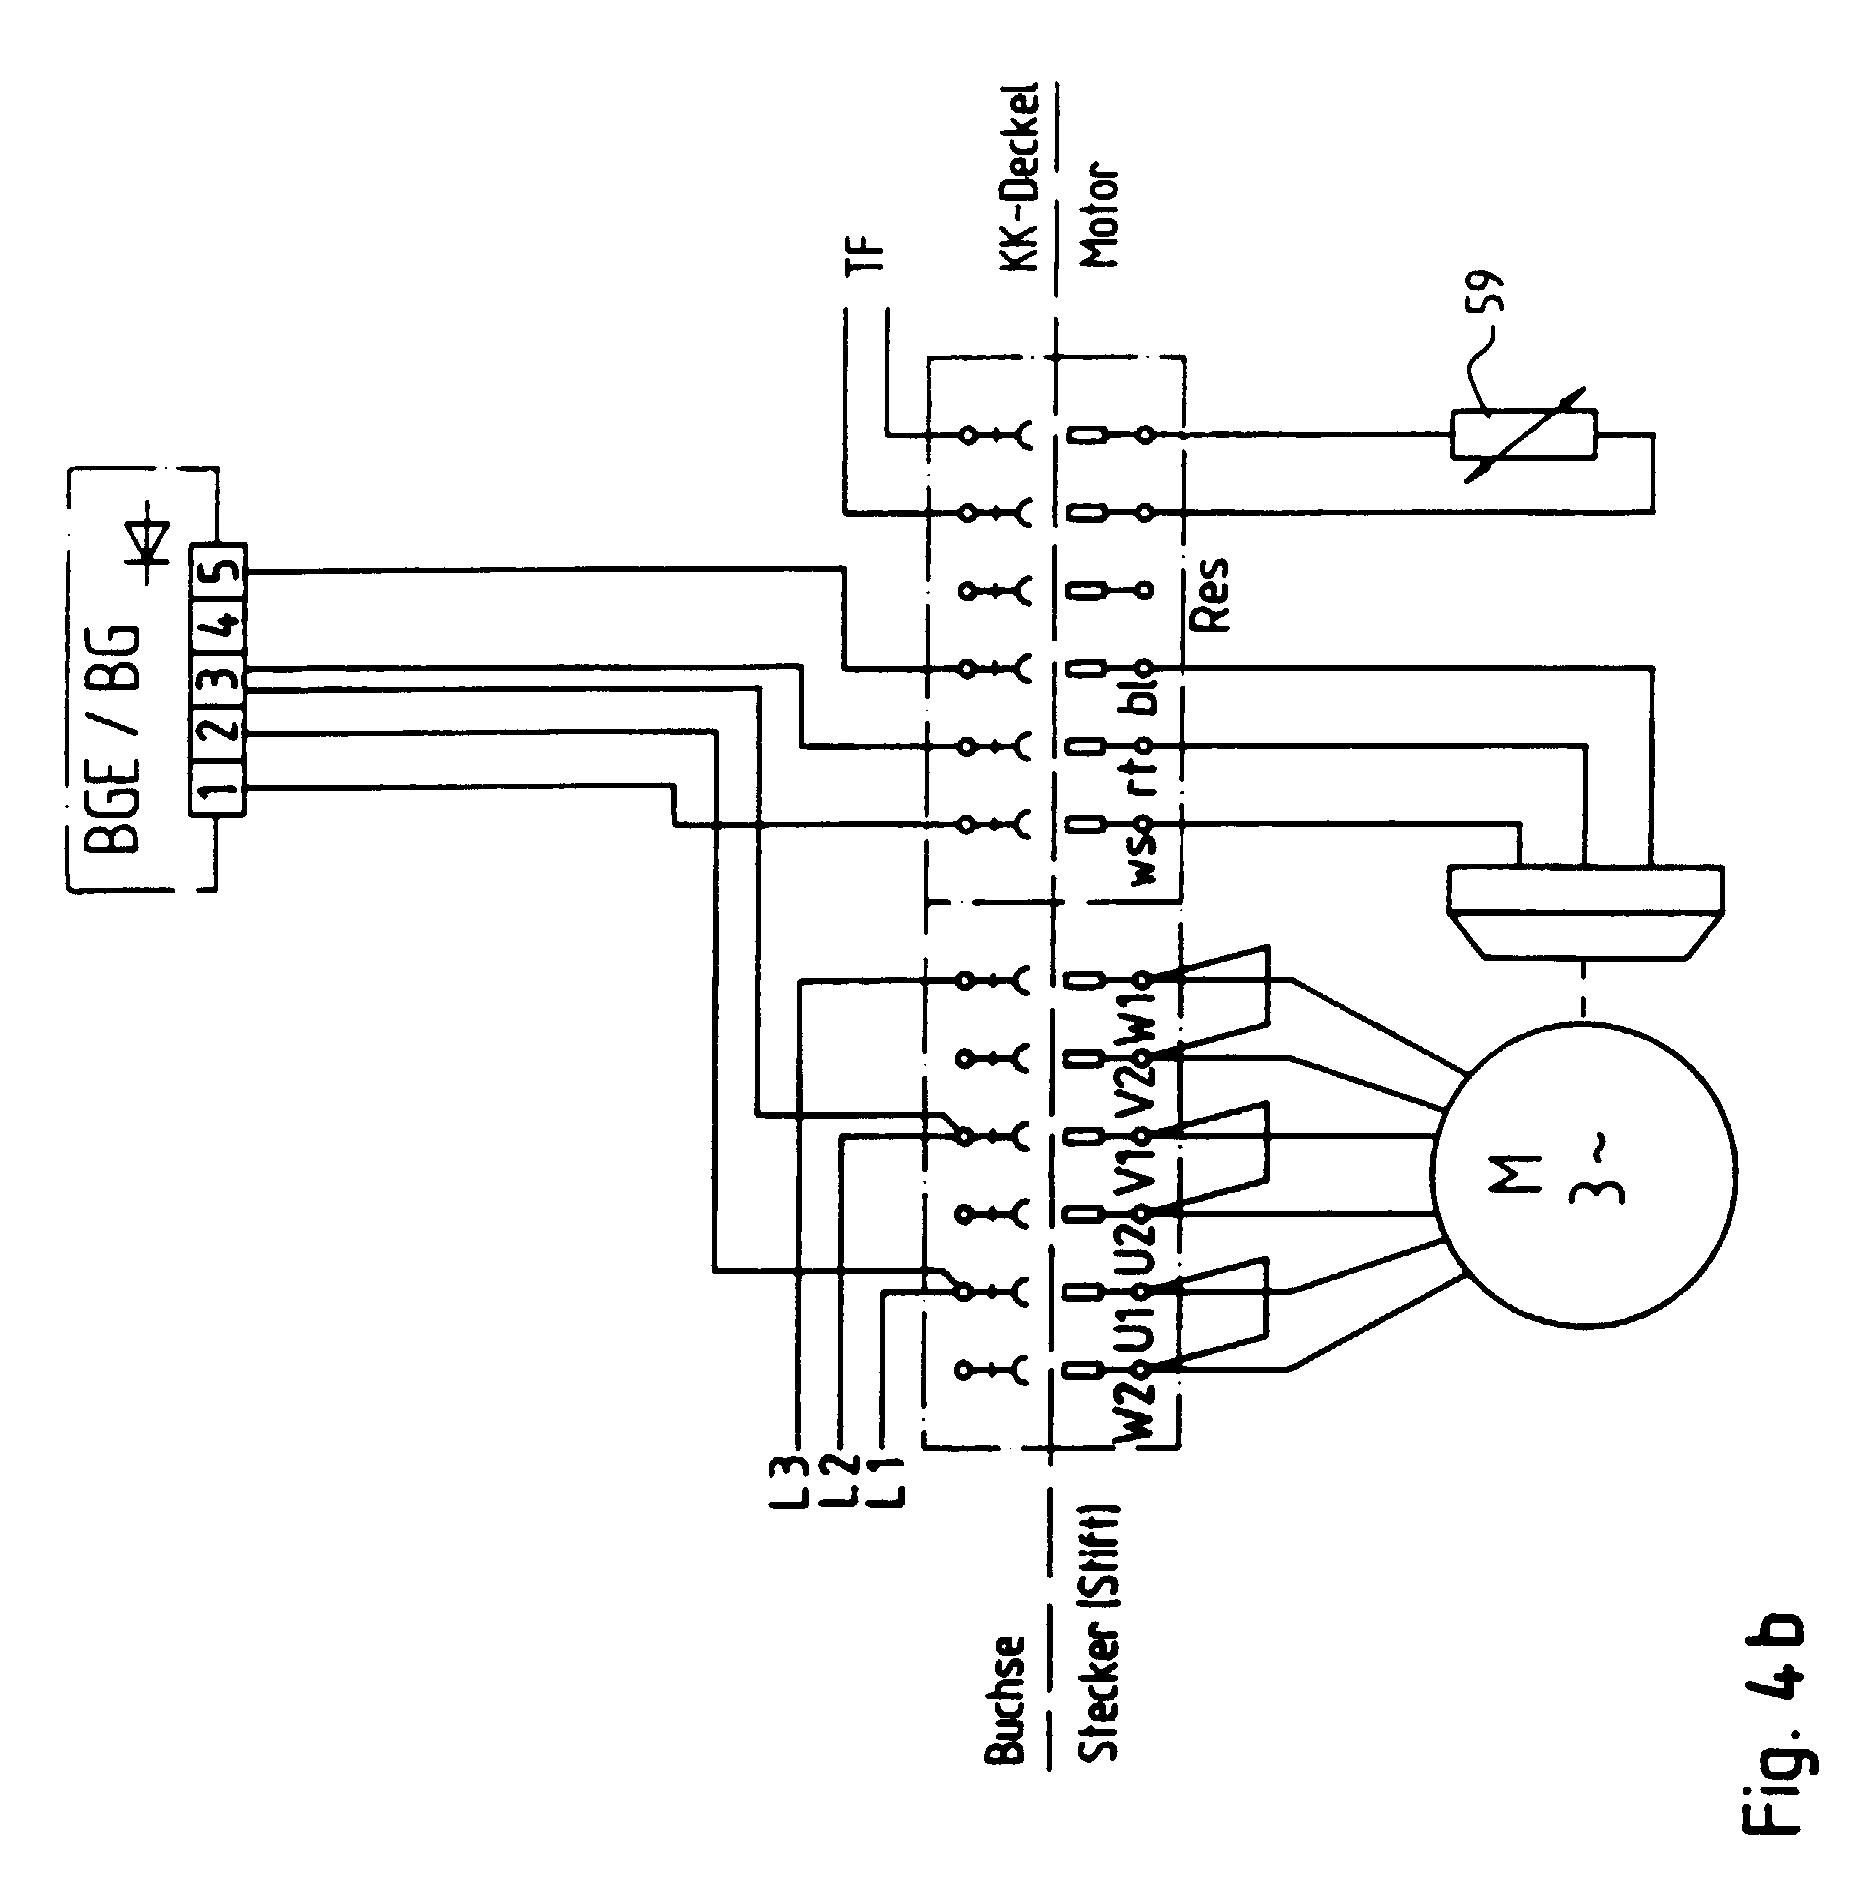 Sew Eurodrive Wiring Diagram Encoder Diagrams 16 Ingersoll Rand